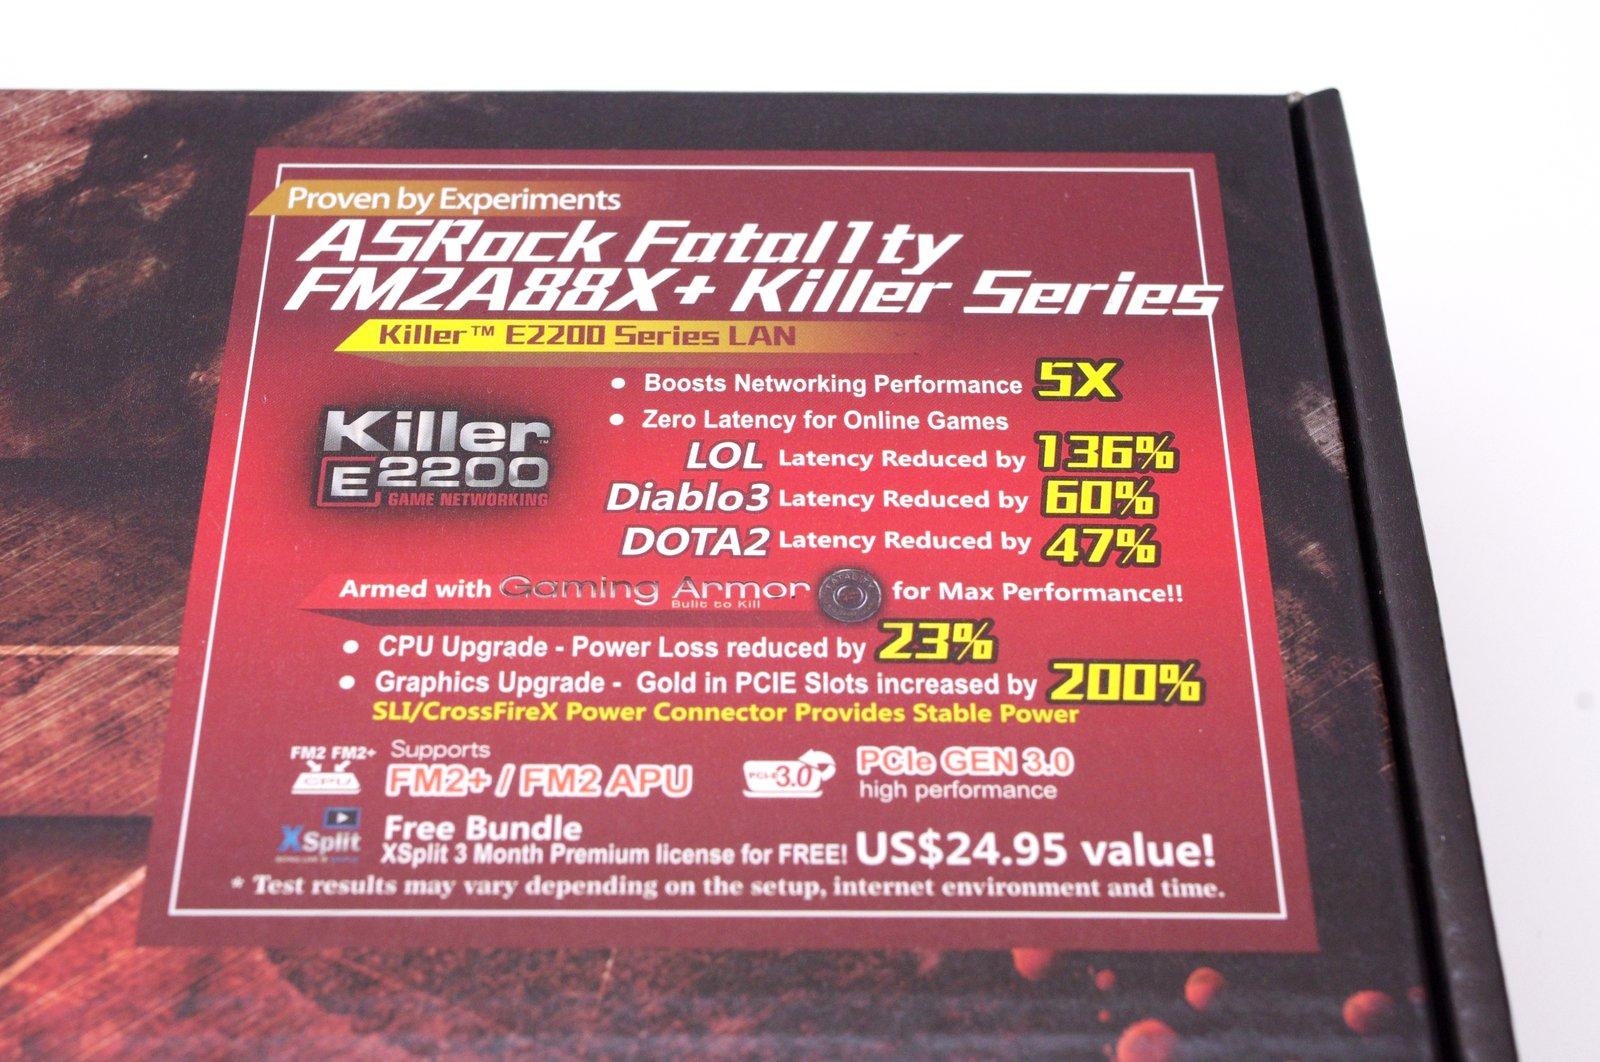 [XF] 誰說 APU 沒有電競殺手 ASRock Fatal1ty FM2A88X+ Killer